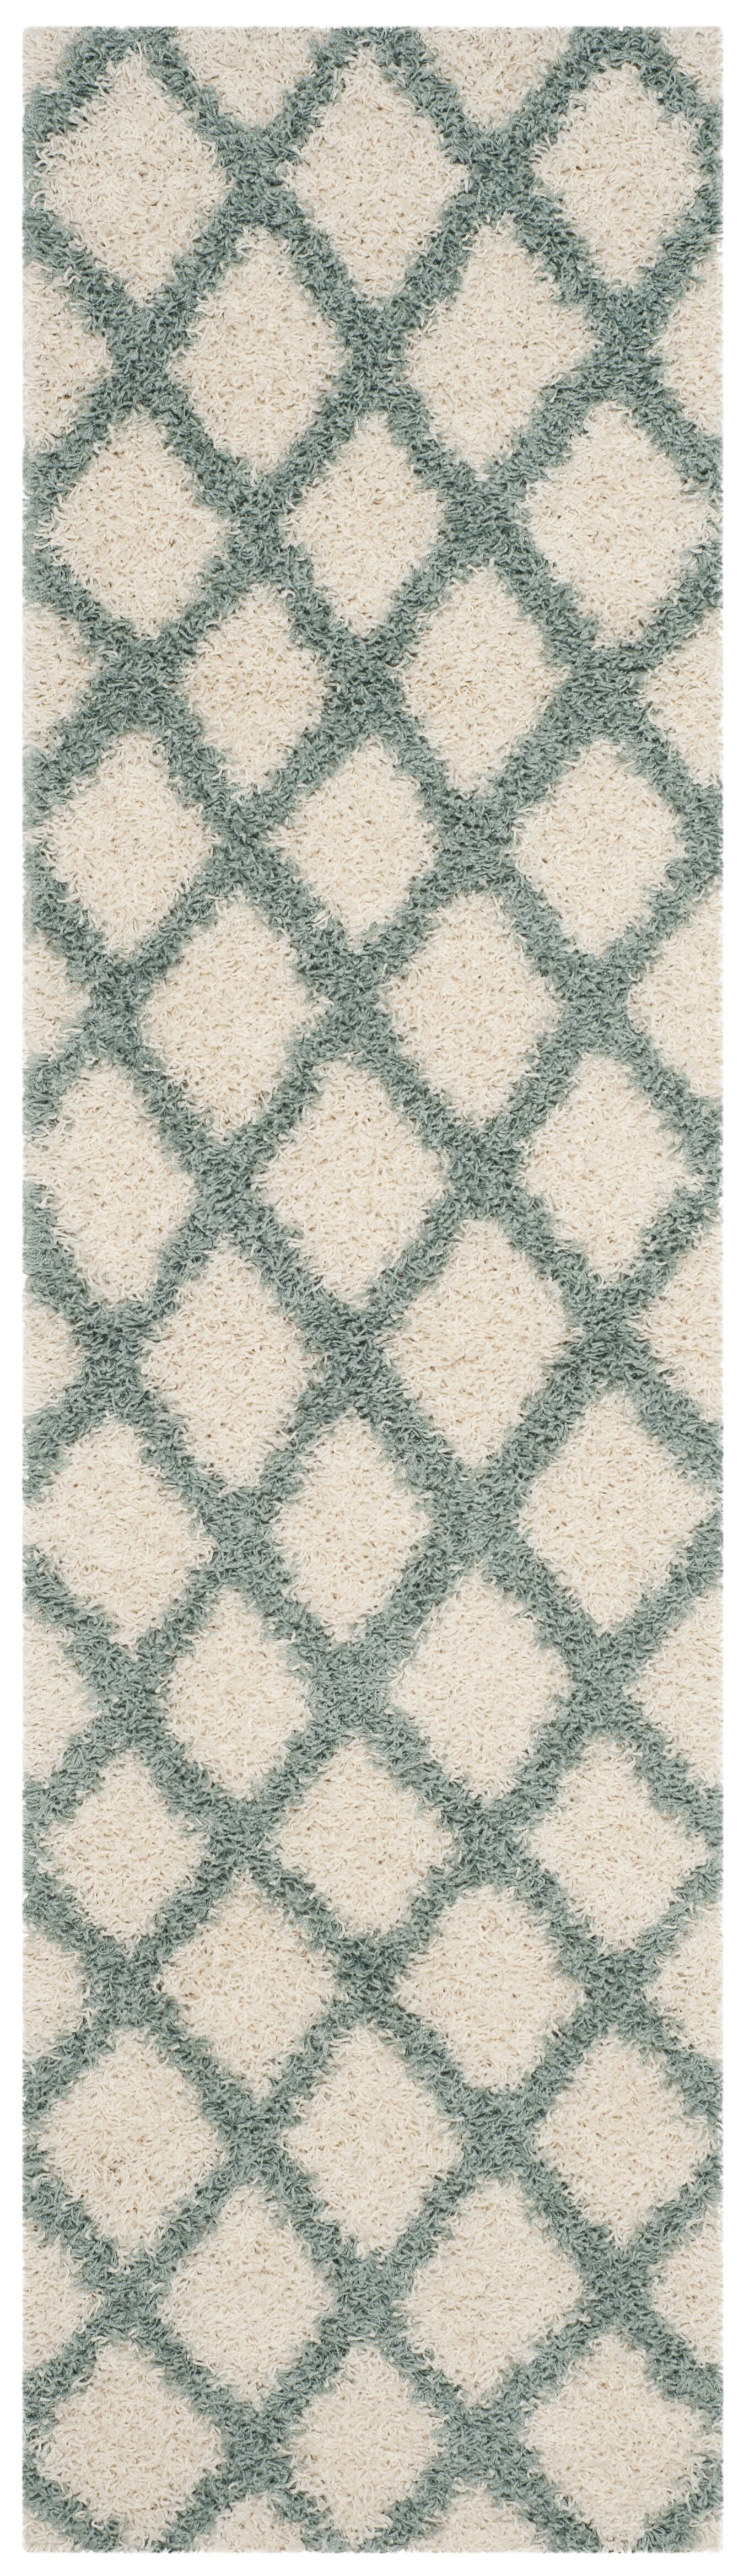 Laurelville Shag Ivory/Seafoam Area Rug Rug Size: 4' x 6'